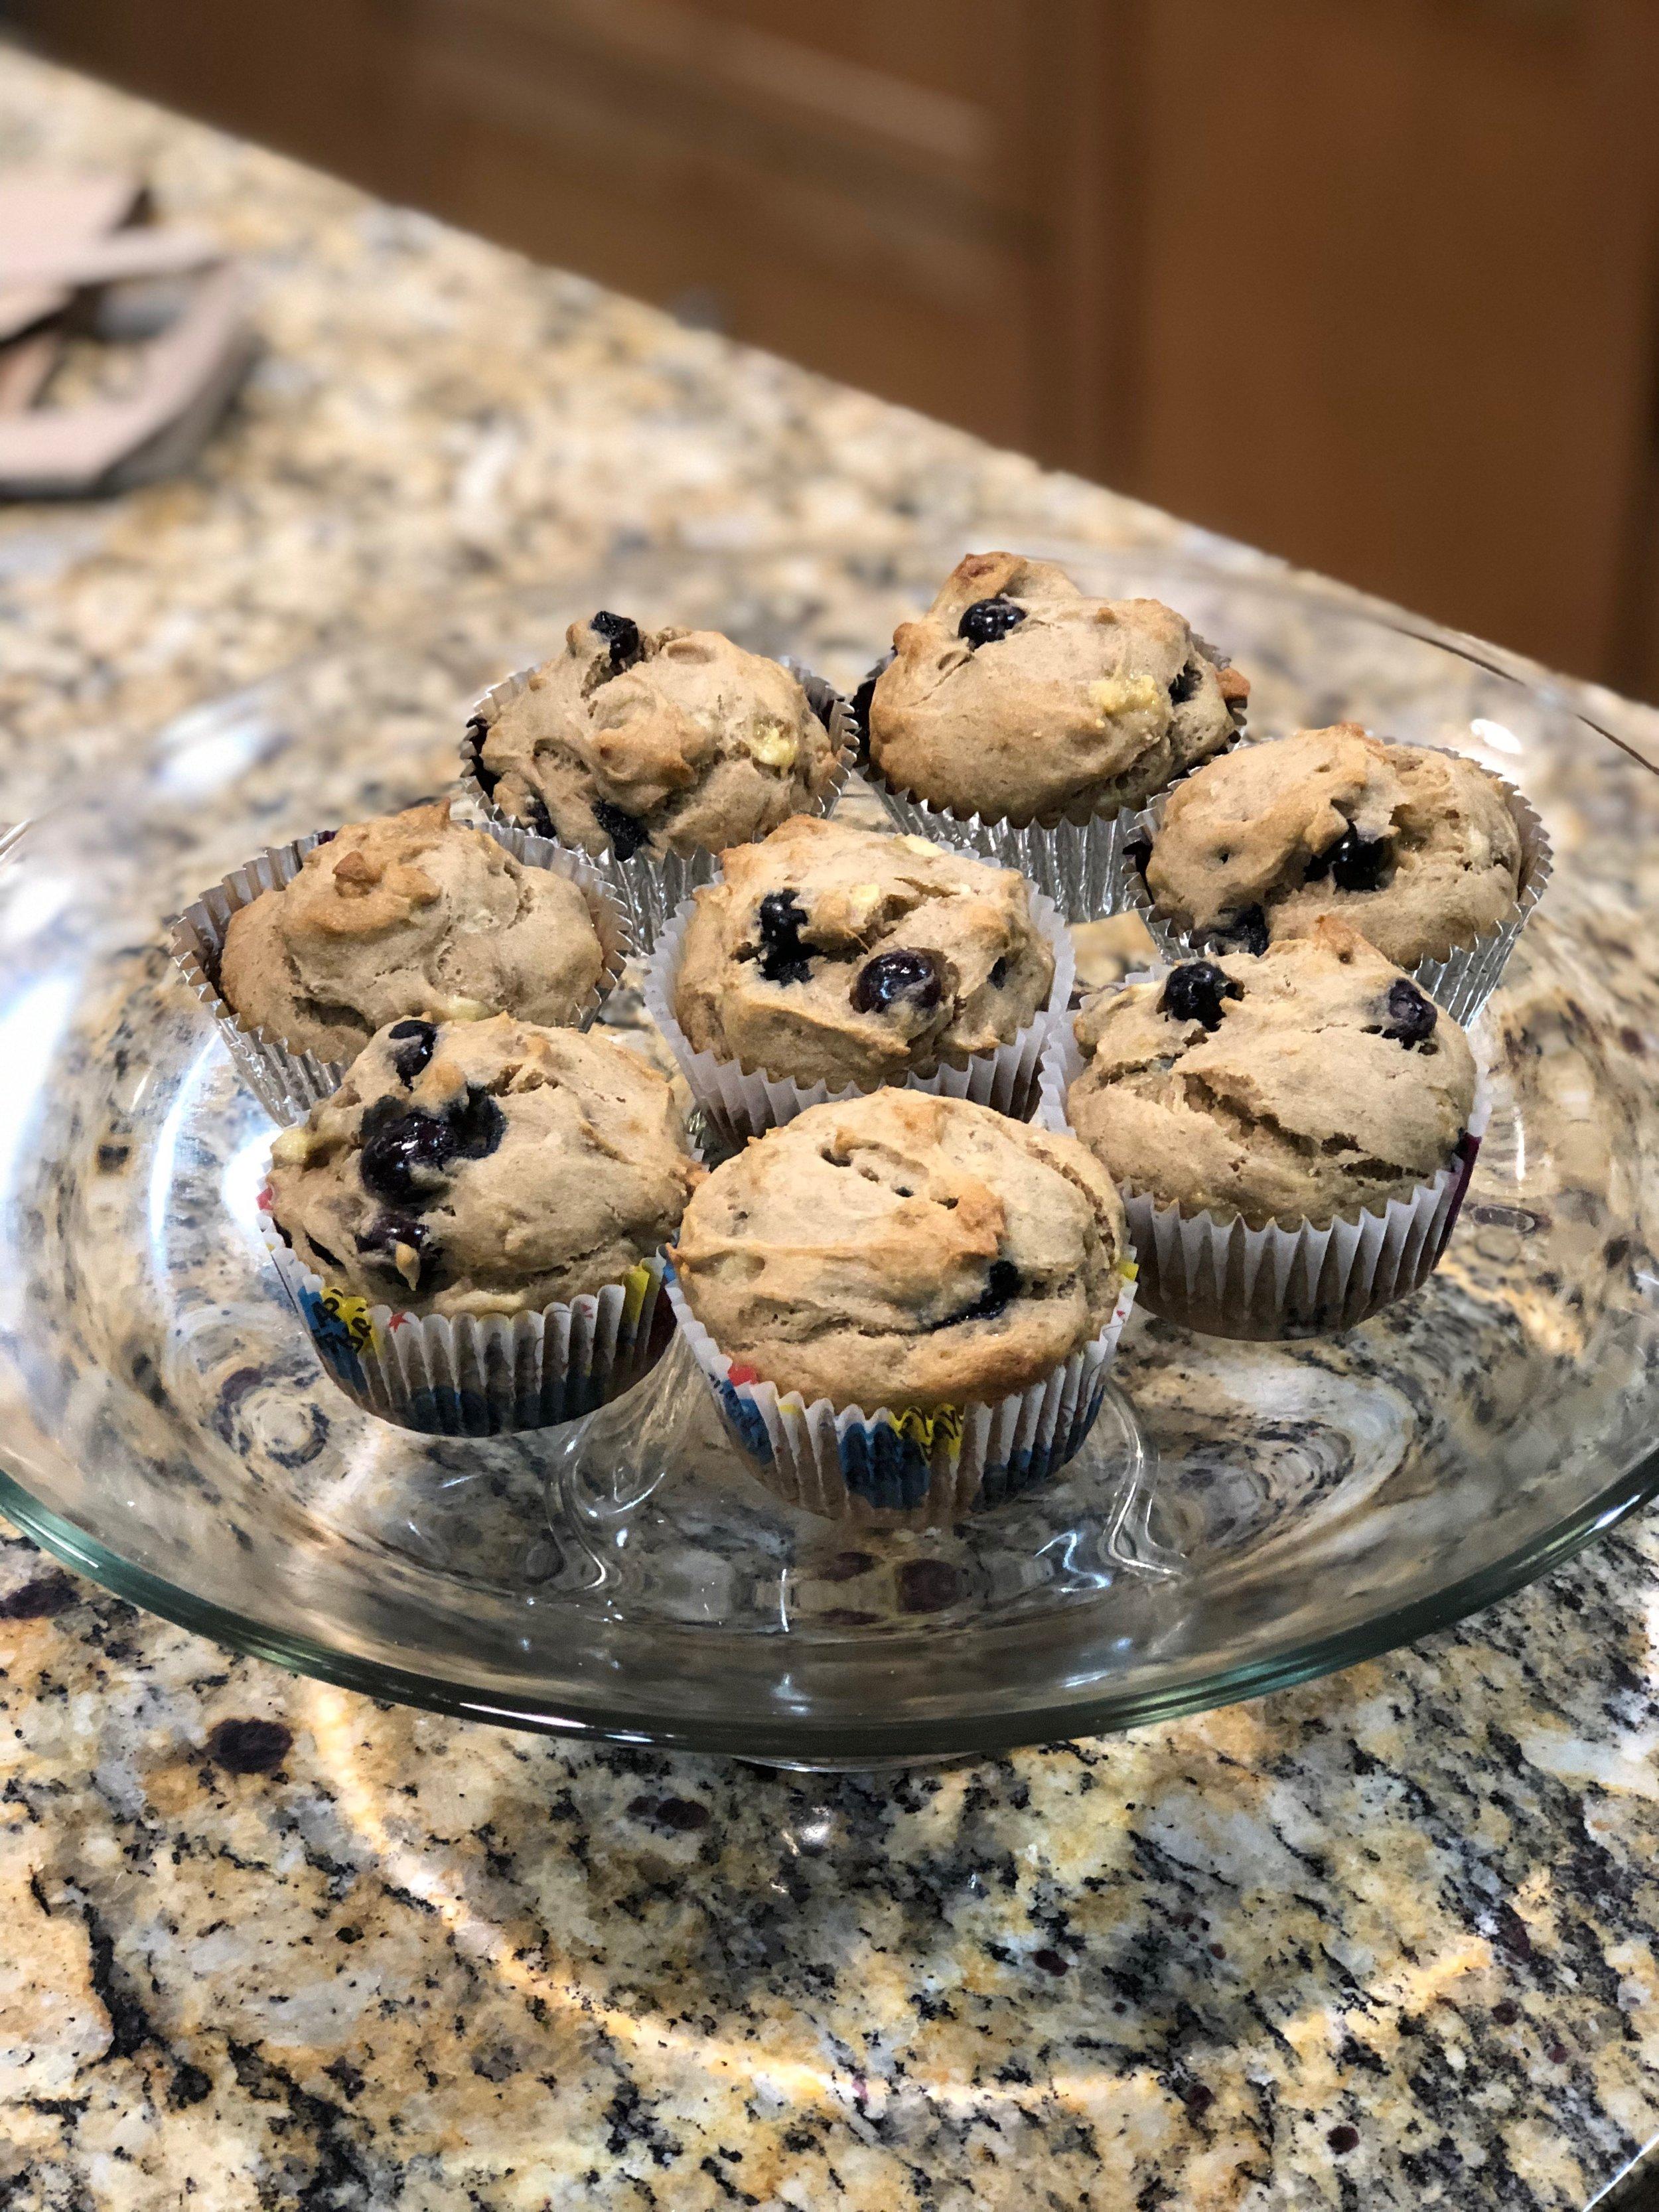 Blueberry Banana Breakfast Muffins (Gluten Free, Egg Free, Dairy Free)